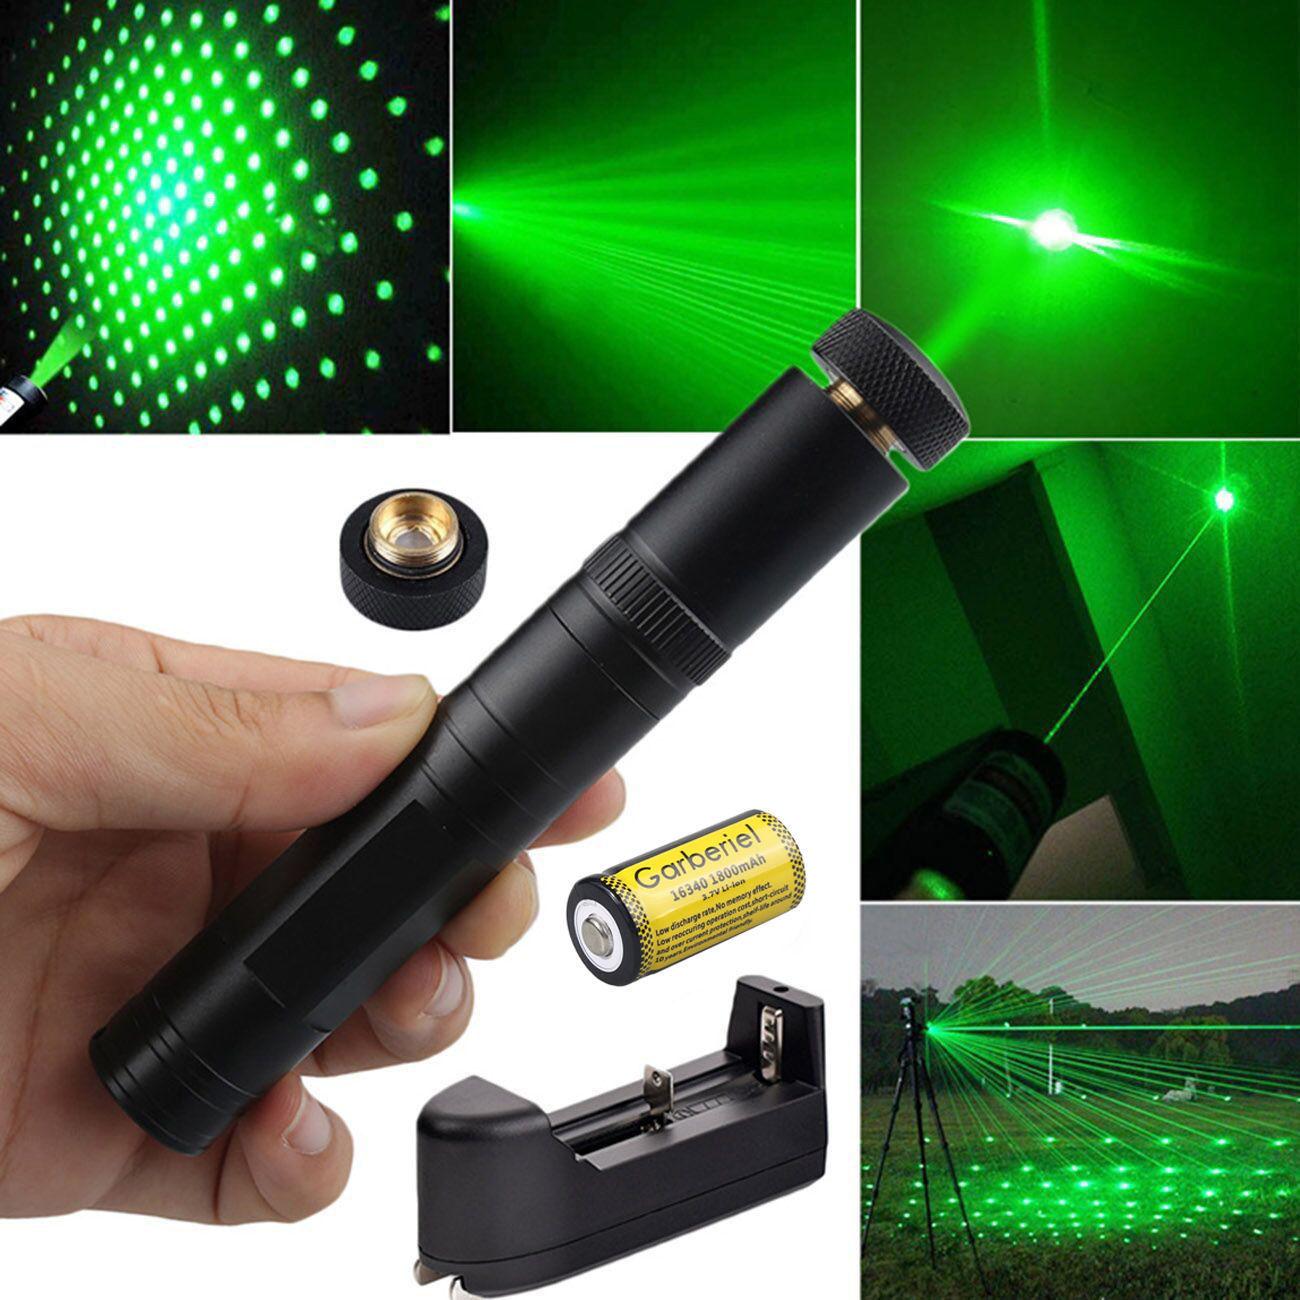 10Miles Green Visible Beam Light Hunting Teacher Pointer pen 16340&Charger